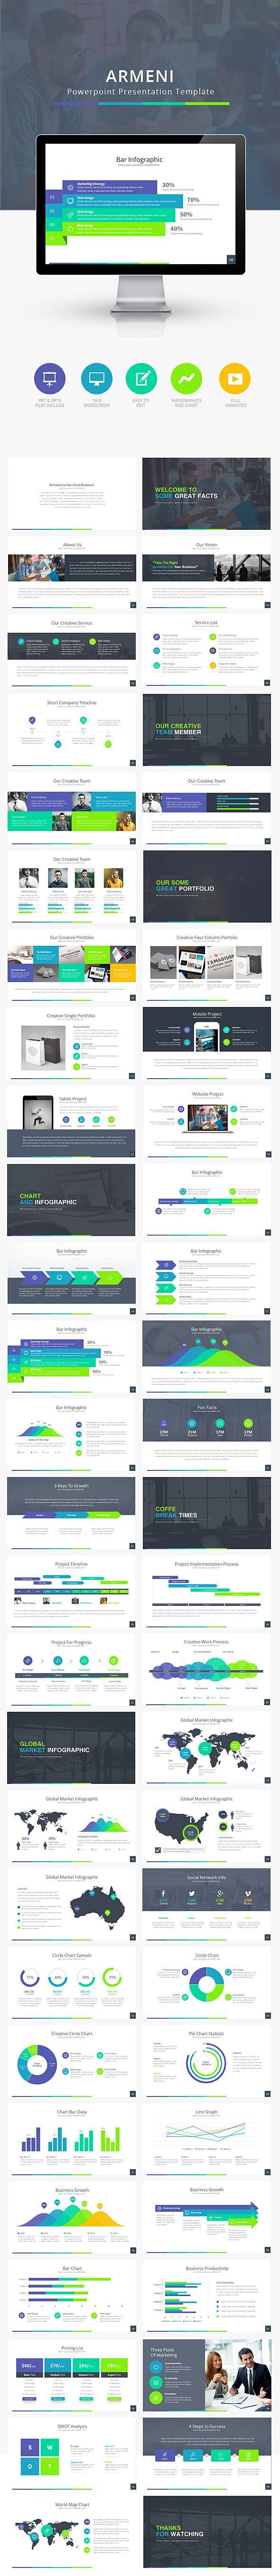 Armeni Powerpoint Presentation Template #armeni #powerpoint #presentation #template